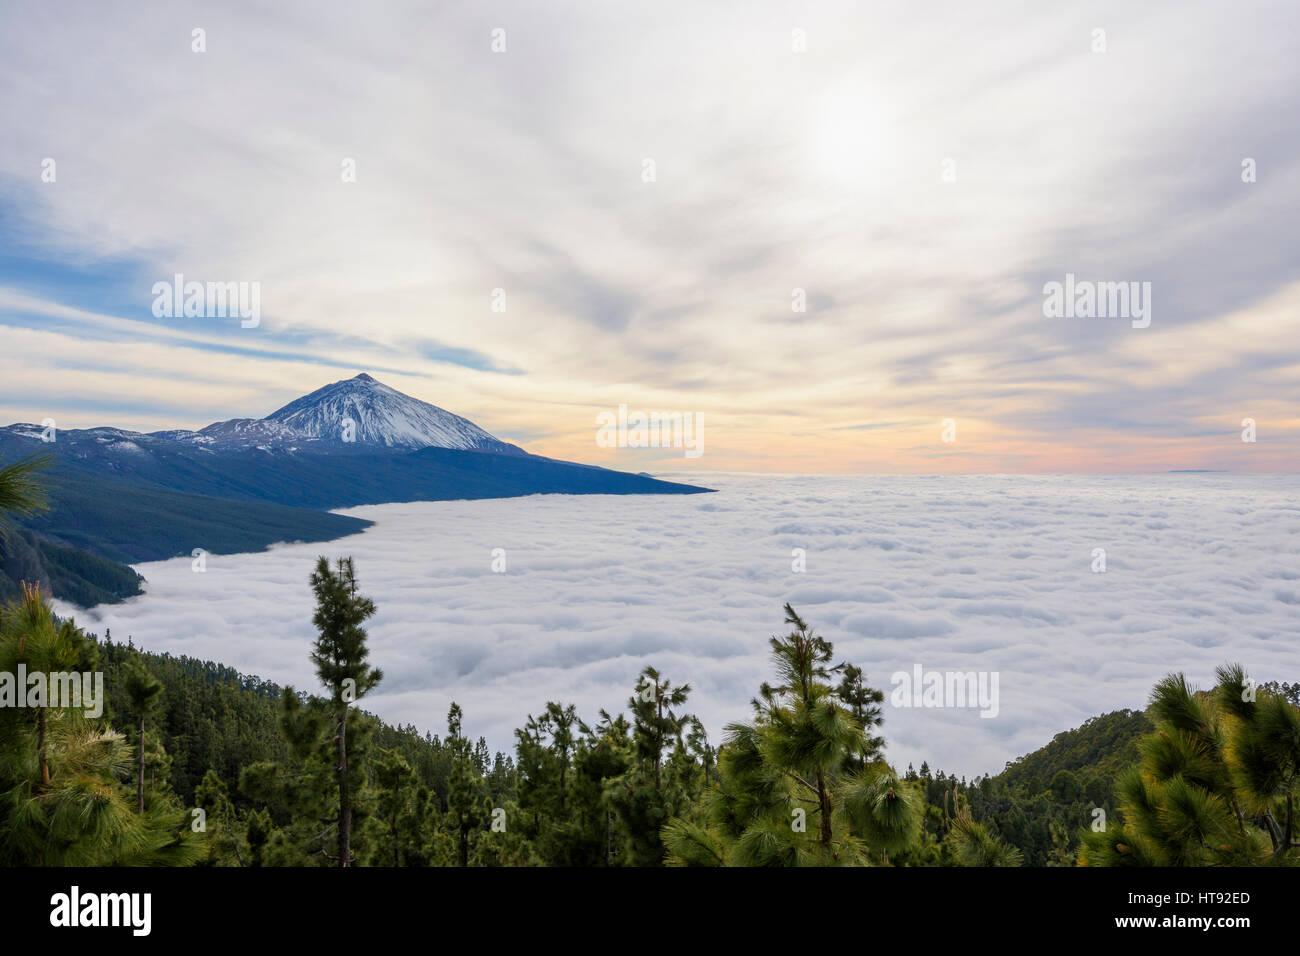 Pico del Teide Berg mit Wolken, Parque Nacional del Teide, Teneriffa, Kanarische Inseln, Spanien Stockbild